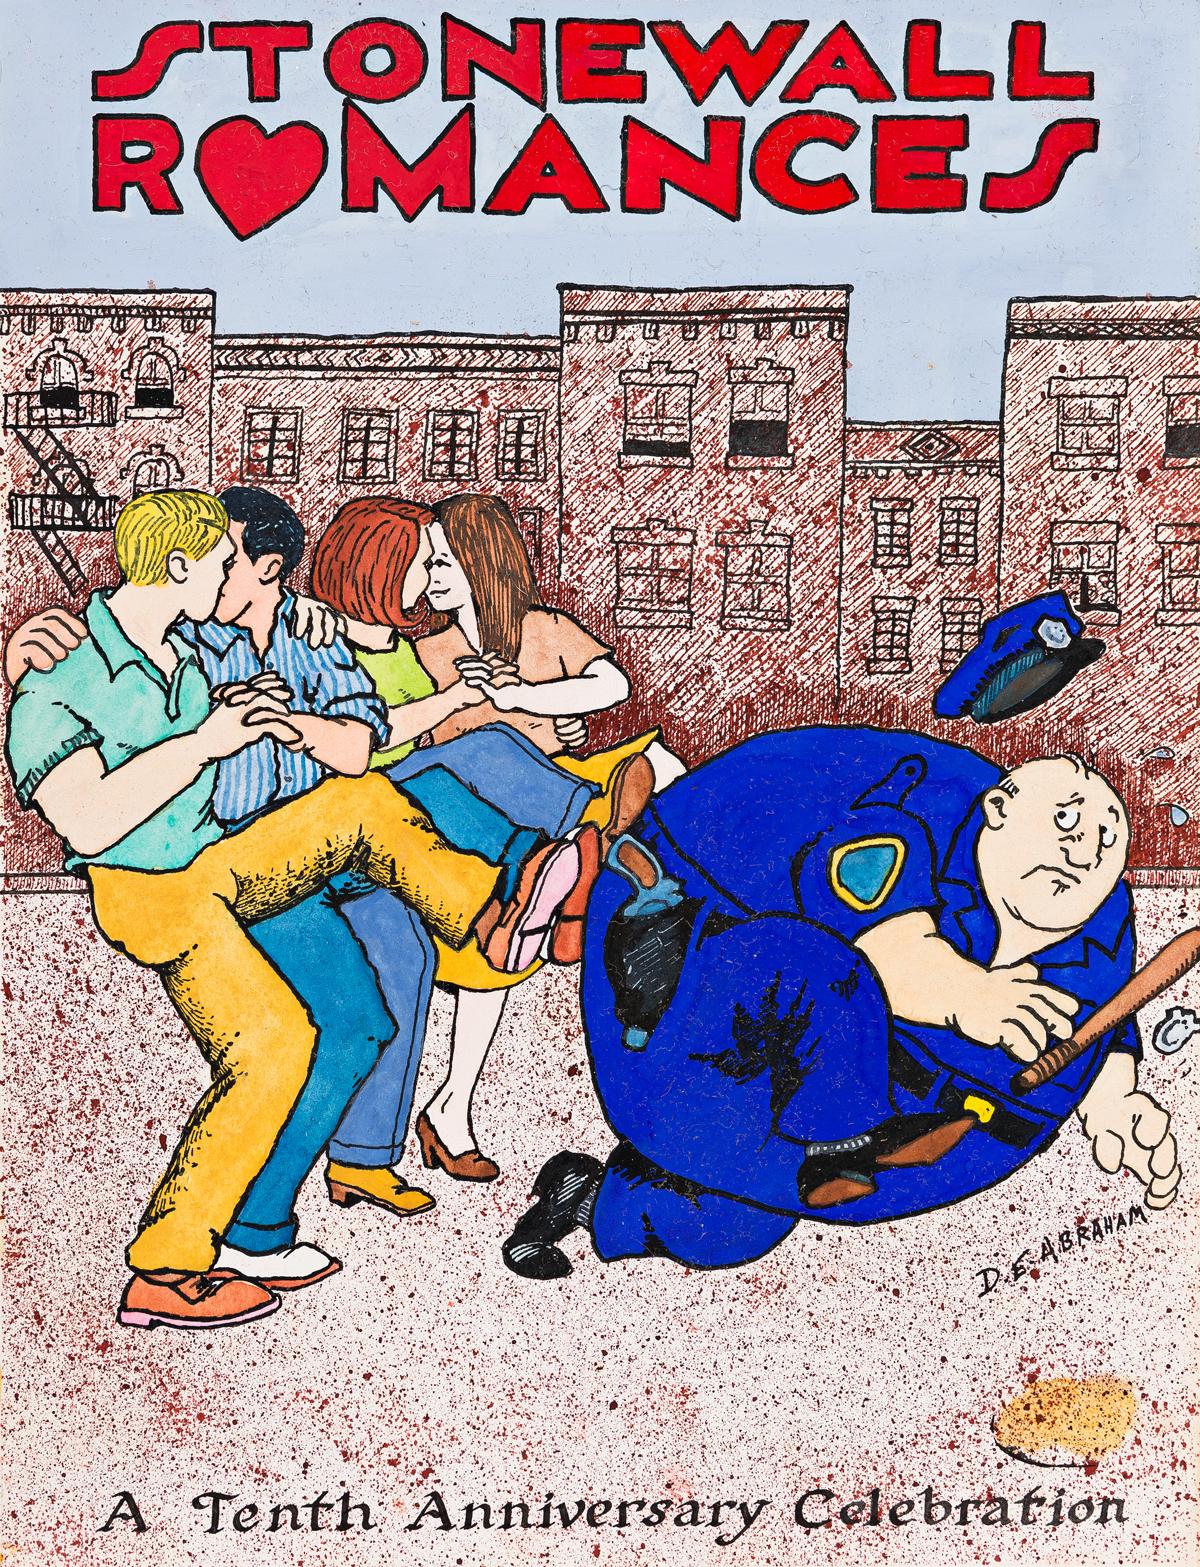 DANIEL-ABRAHAM-(1952--)--STONEWALL-UPRISING-Original-artwork